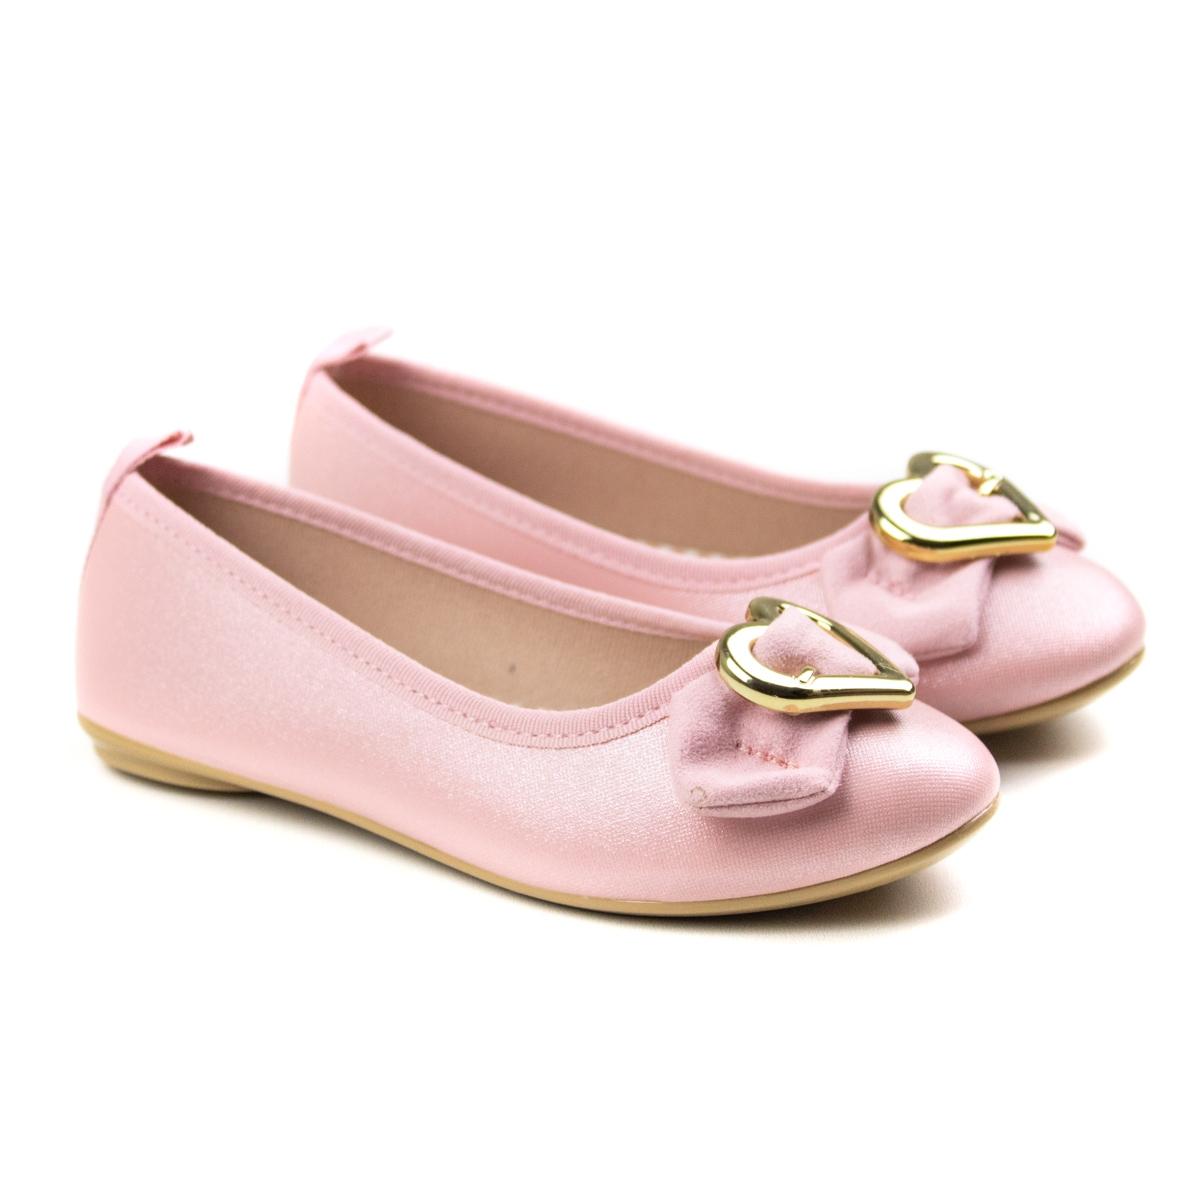 Sapatilha Napa Glitter Infantil Feminina Molekinha - Rosa